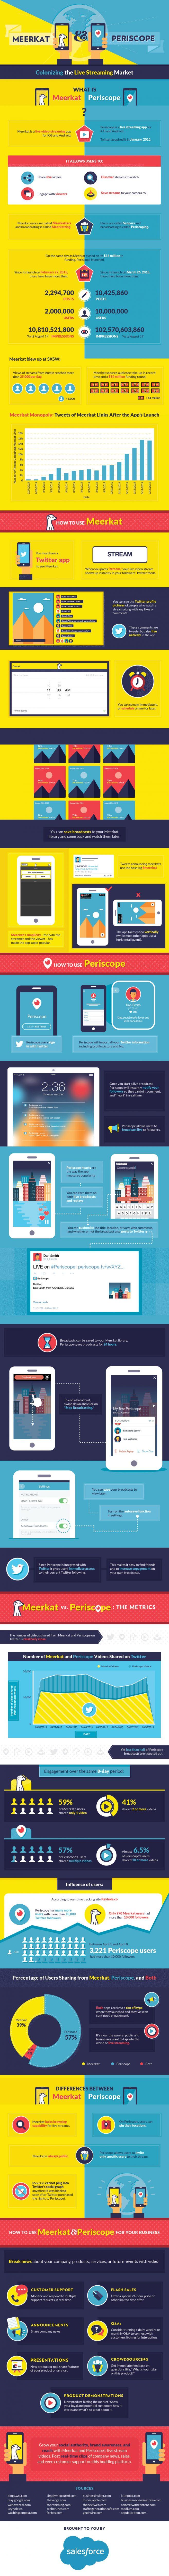 "Infografik: Meerkat und Periscope im Marketing. (Grafik: <a href=""https://www.salesforce.com/ca/blog/2015/08/live-streaming.html"">Salesforce</a>)"